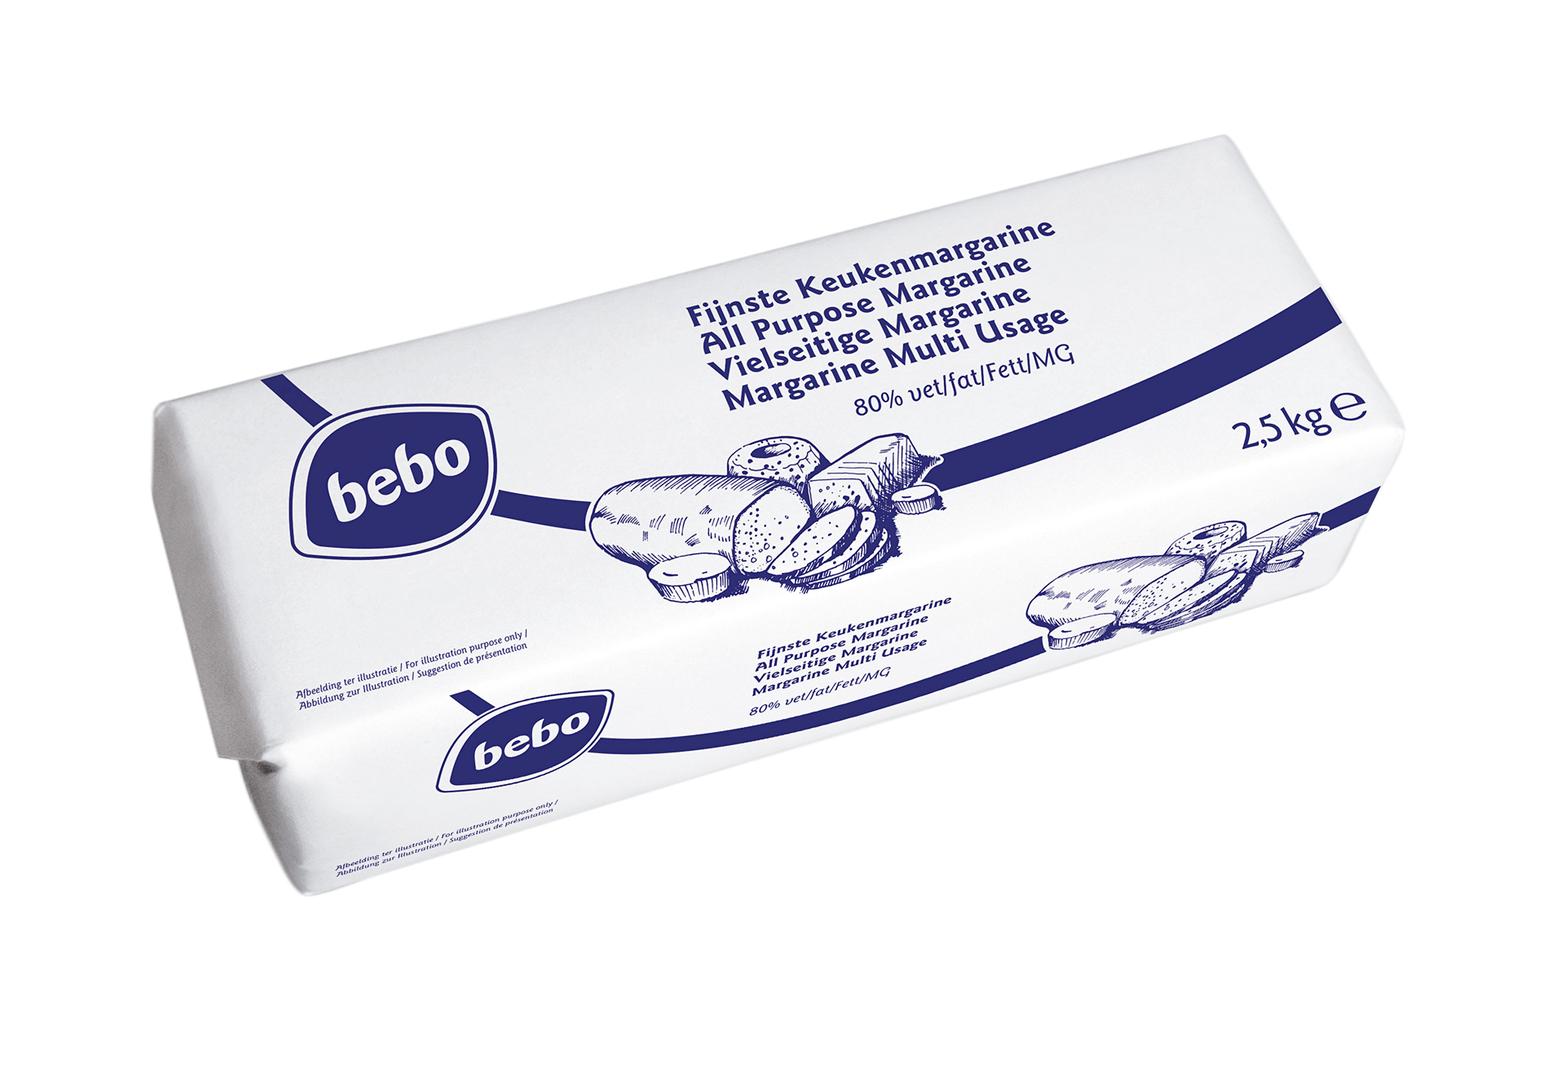 Productafbeelding BEBO Fijnste Keuken Margarine 4x2,5kg